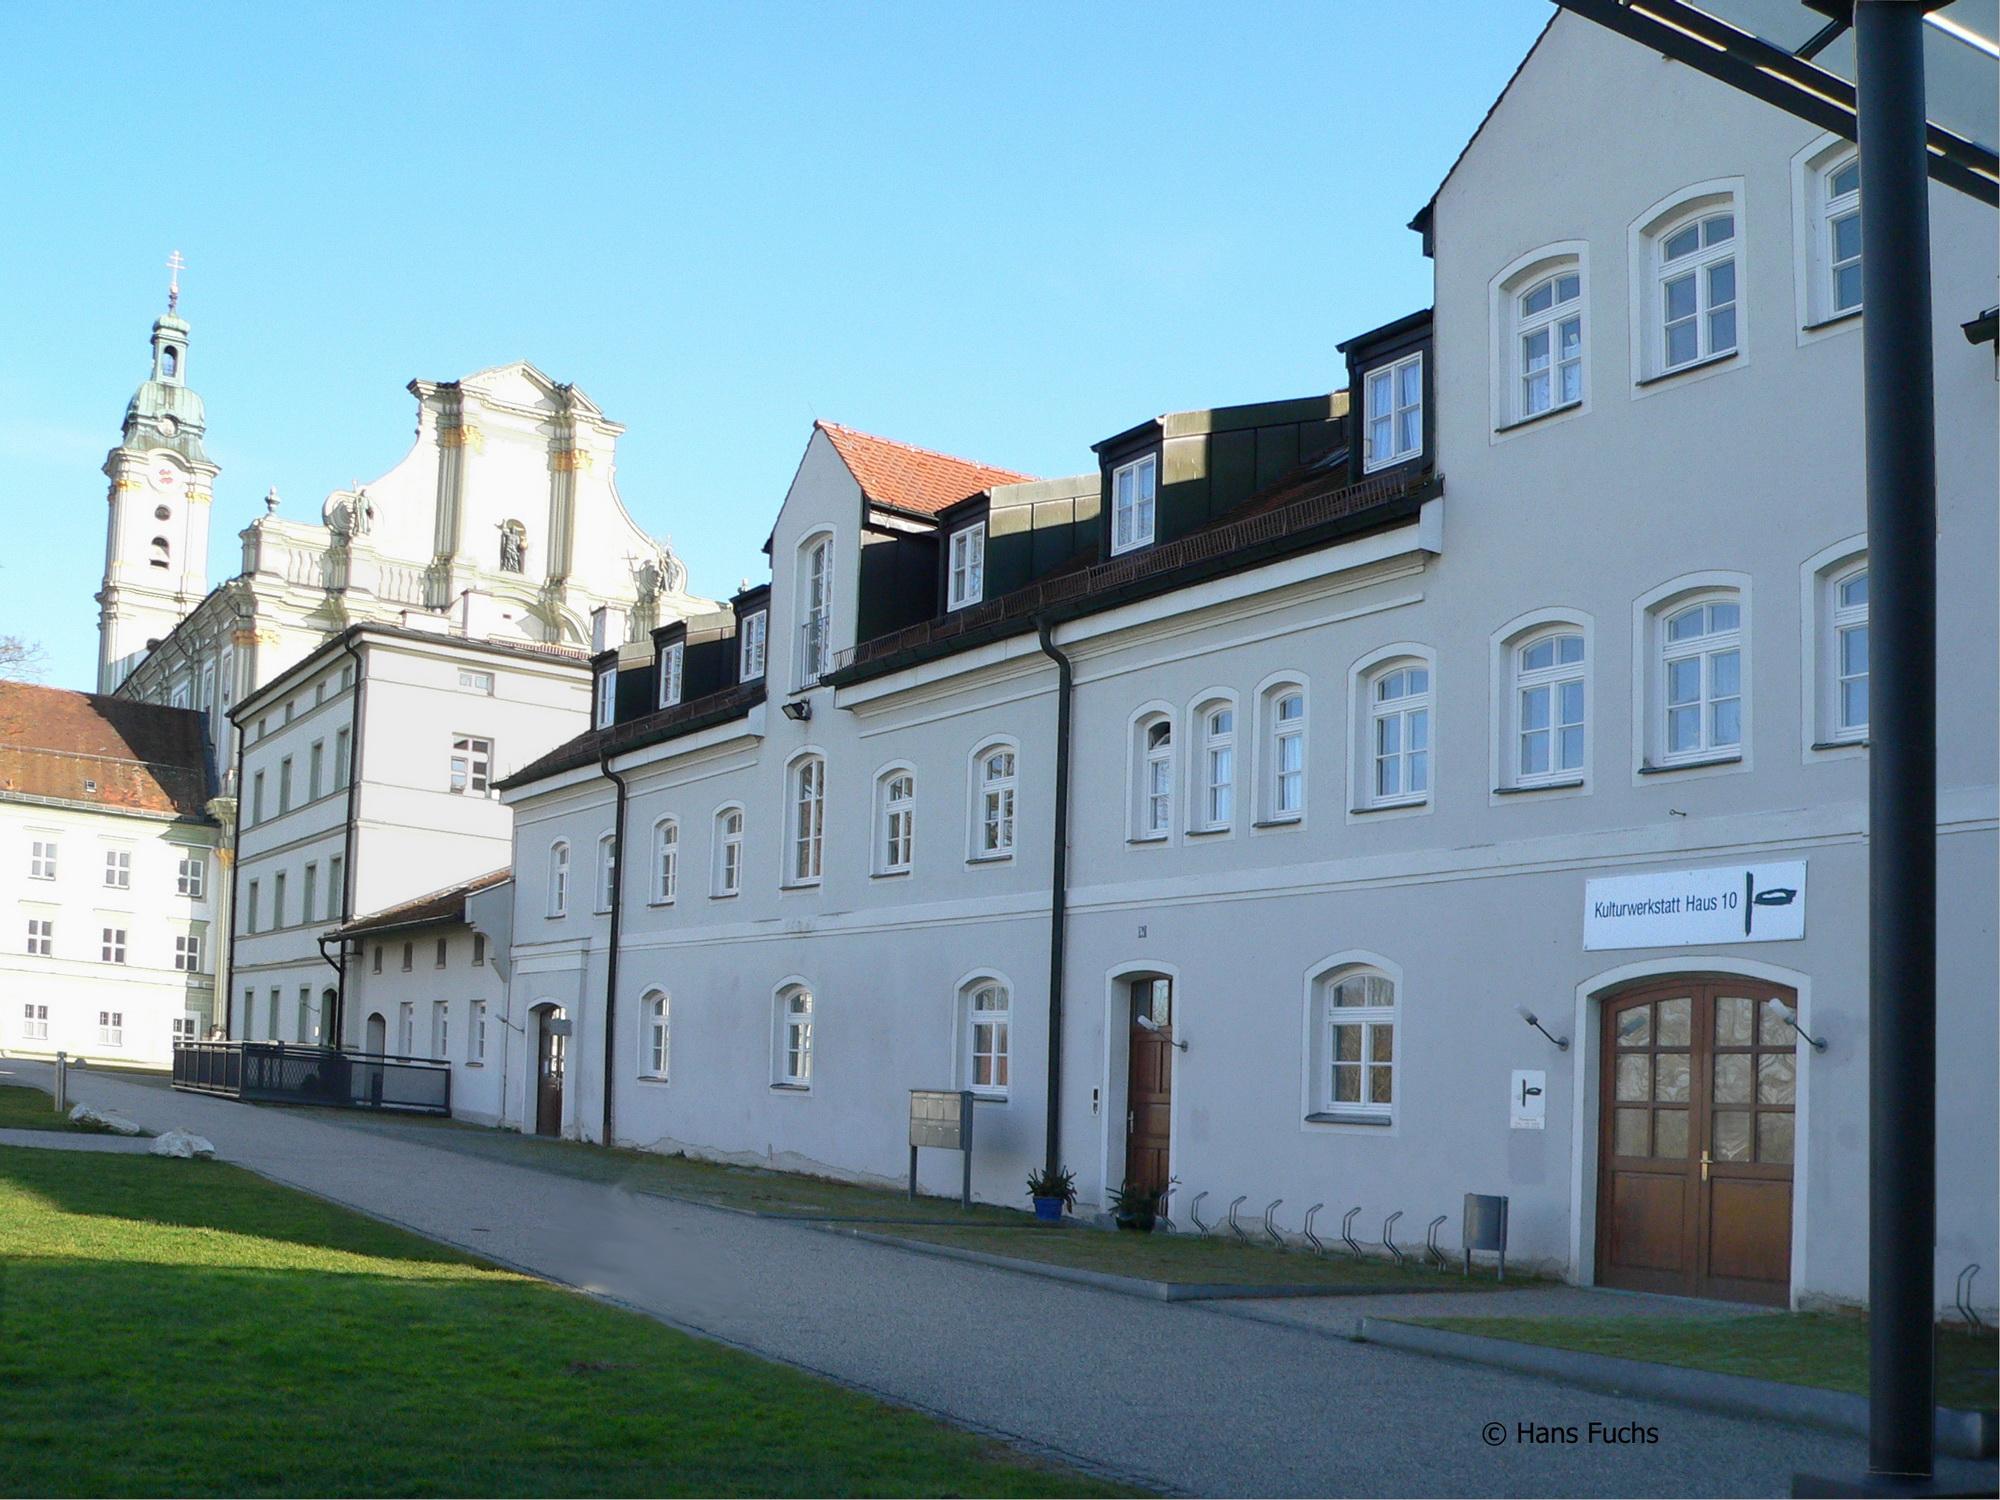 Kulturwerkstatt Haus 10